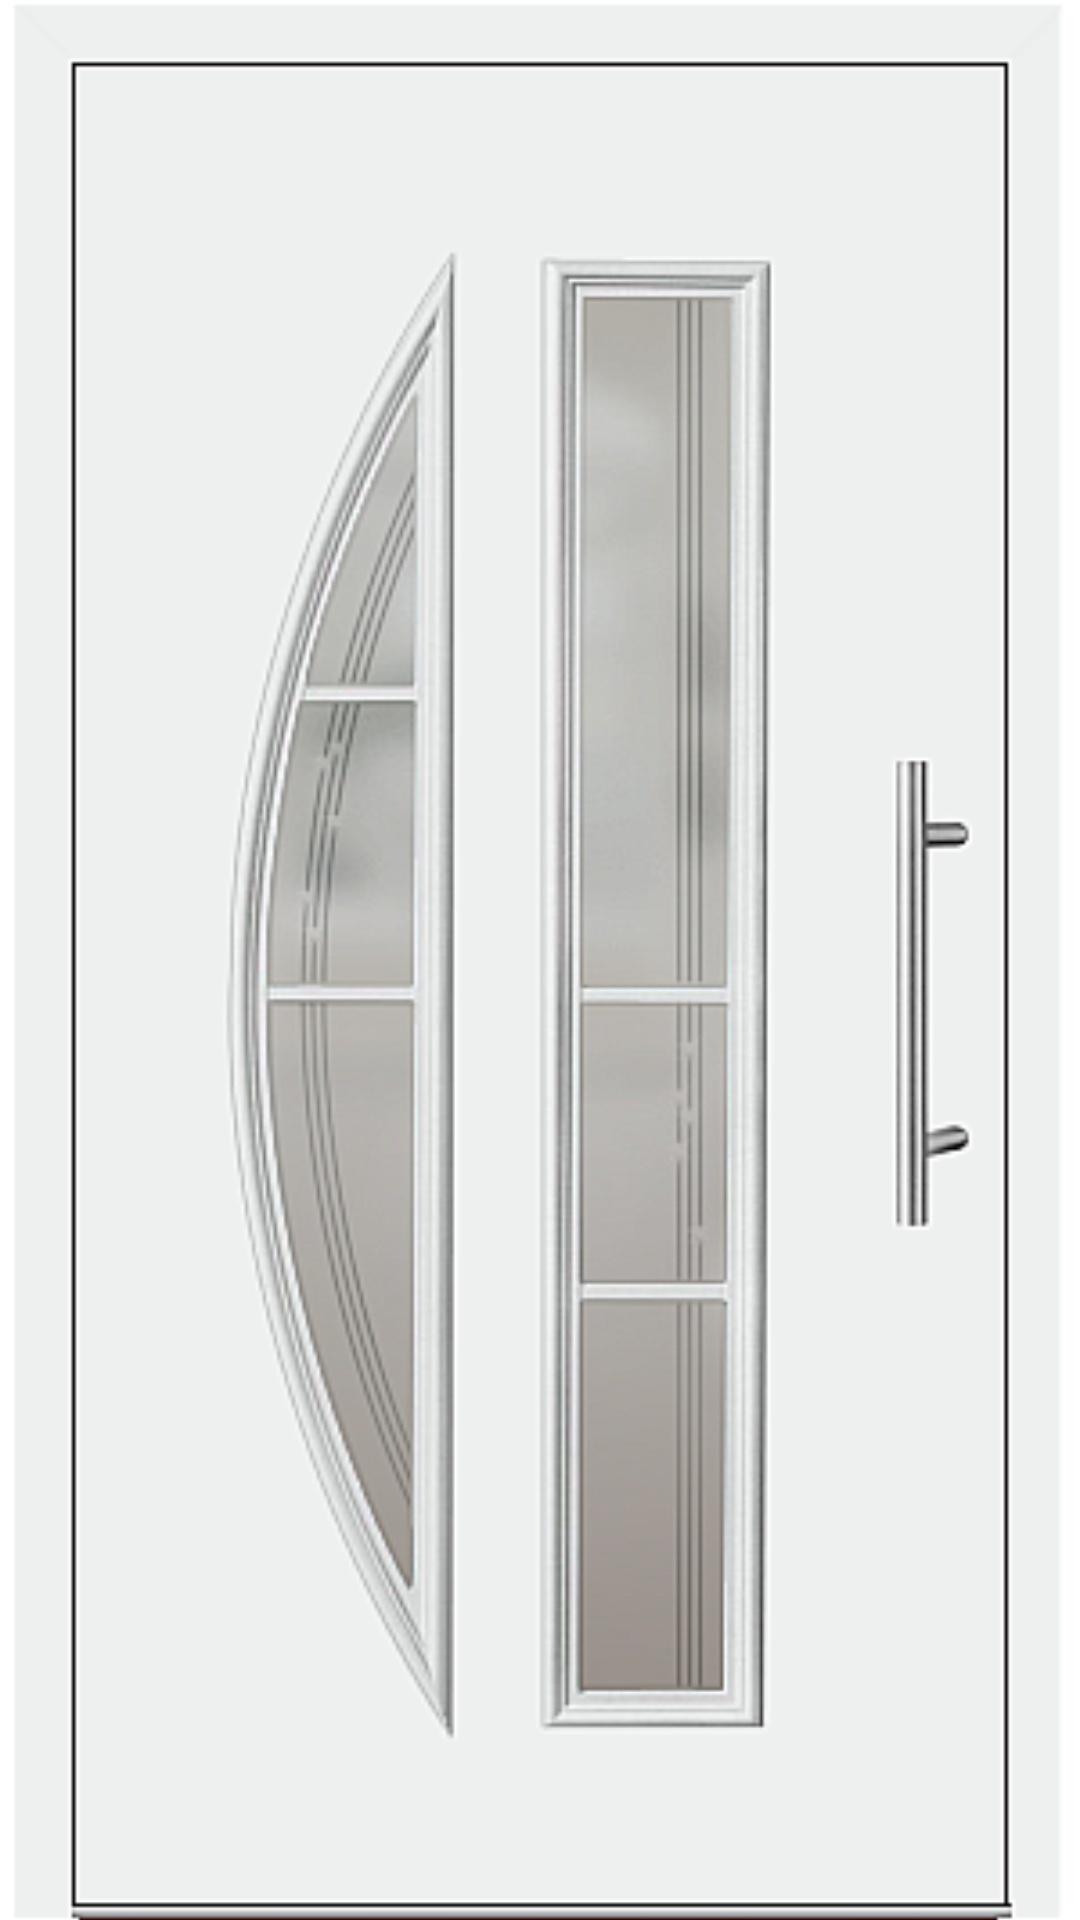 Aluminium Haustür Modell 6525-65 weiß